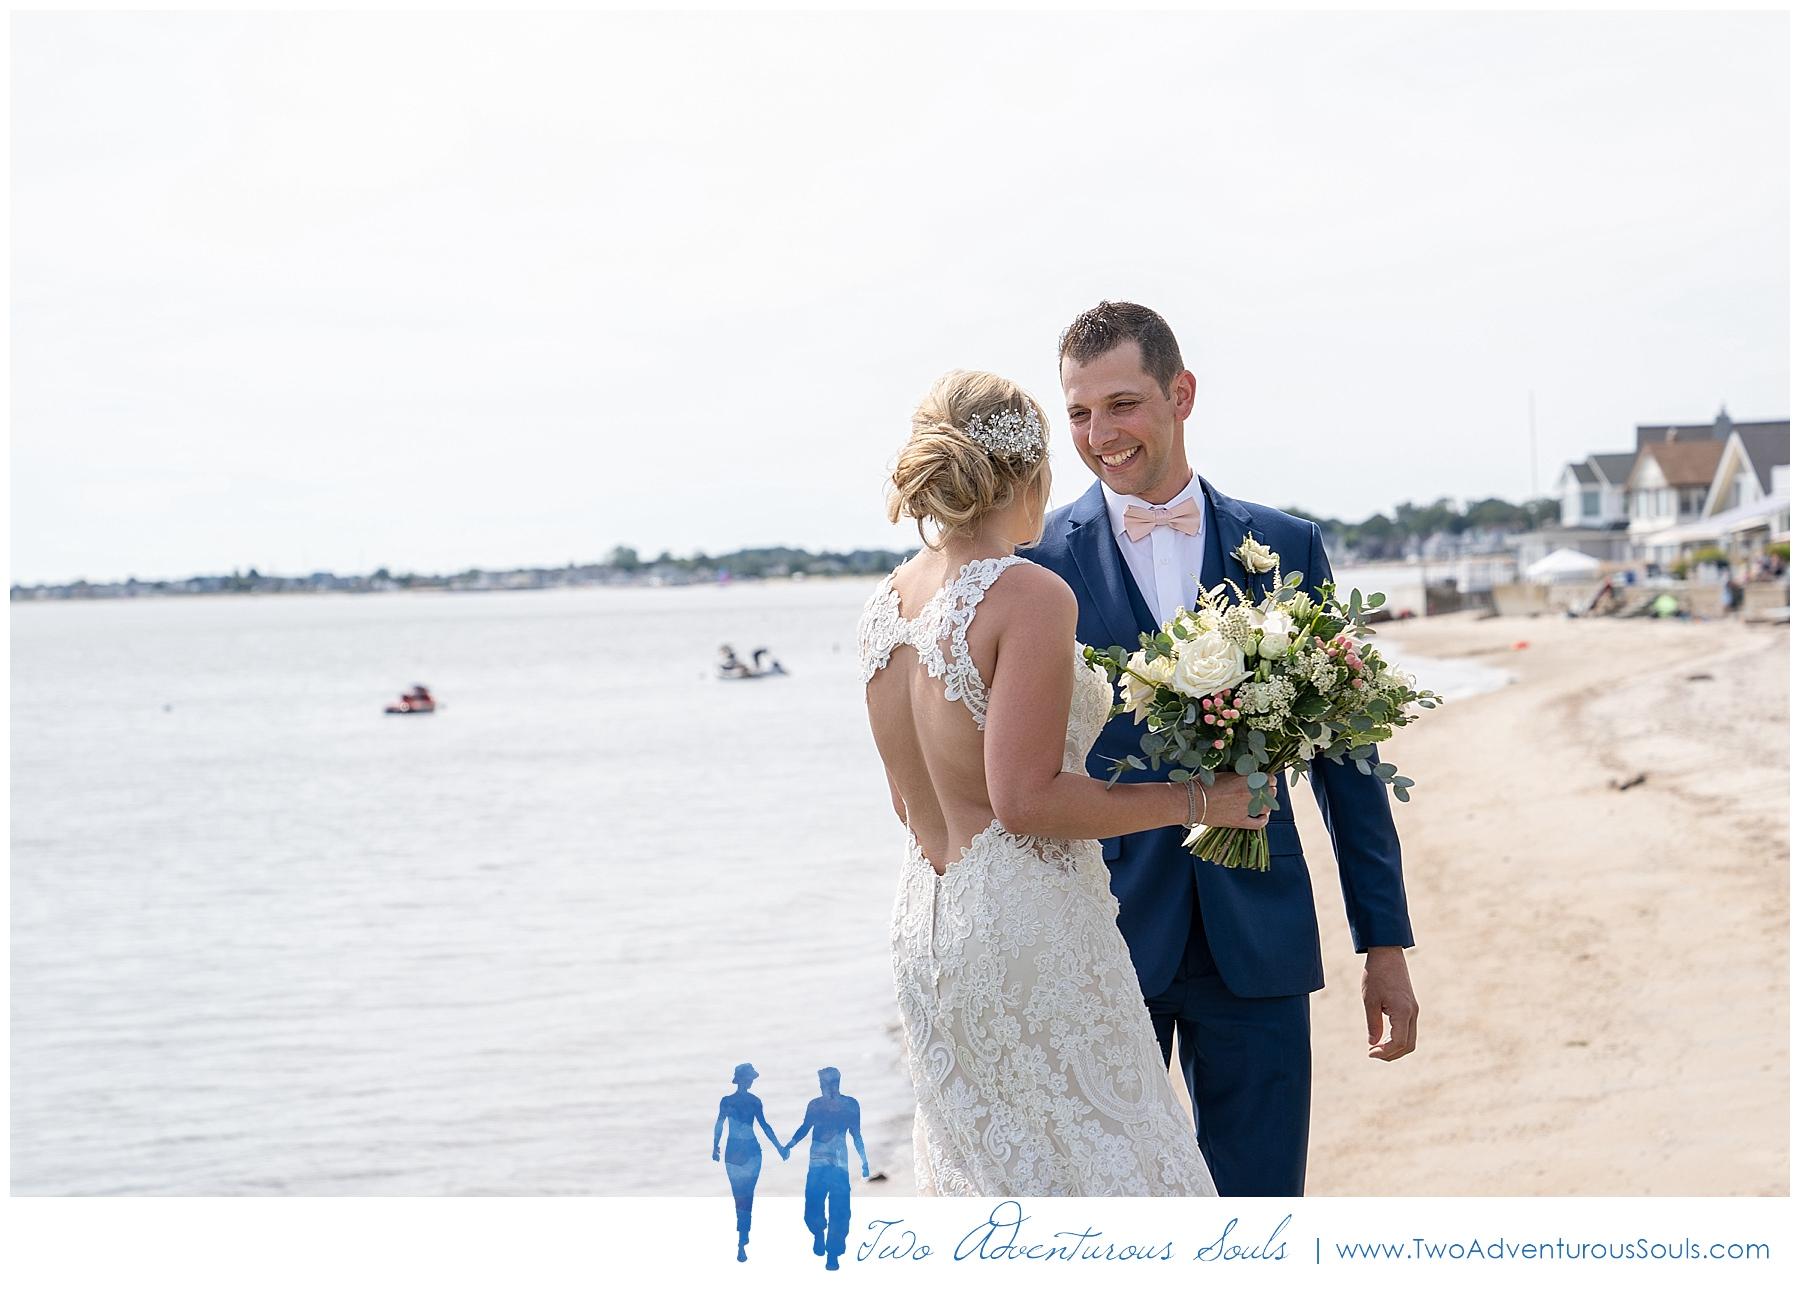 Connecticut Wedding Photographers, Lace Factory Wedding Photographers, Two Adventurous Souls - 083119_0021.jpg